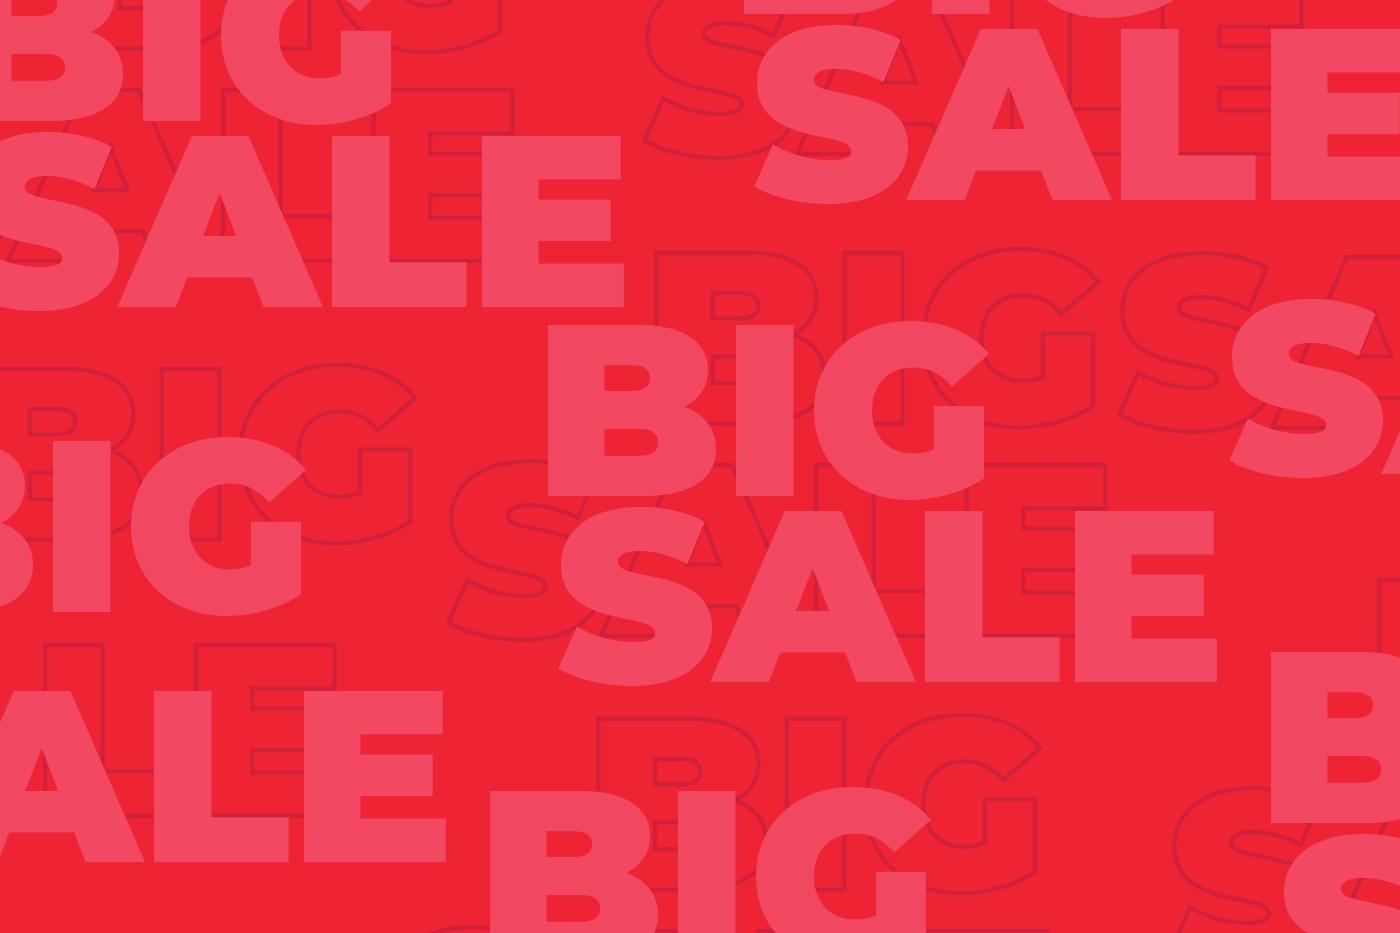 sale-banner